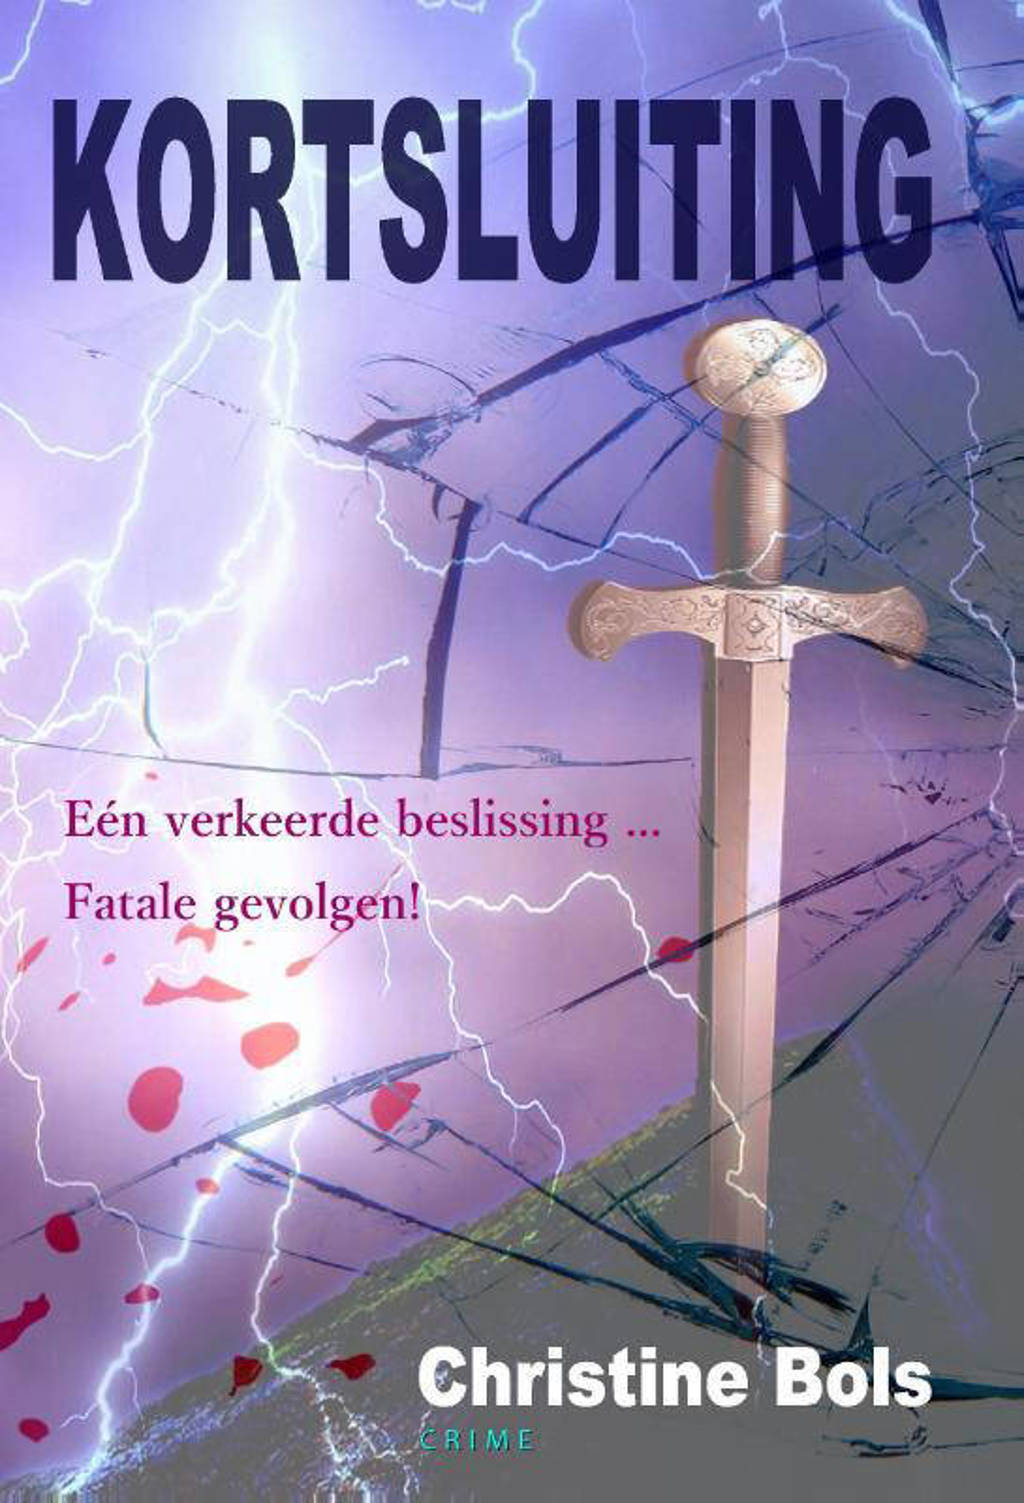 Kortsluiting - Christine Bols